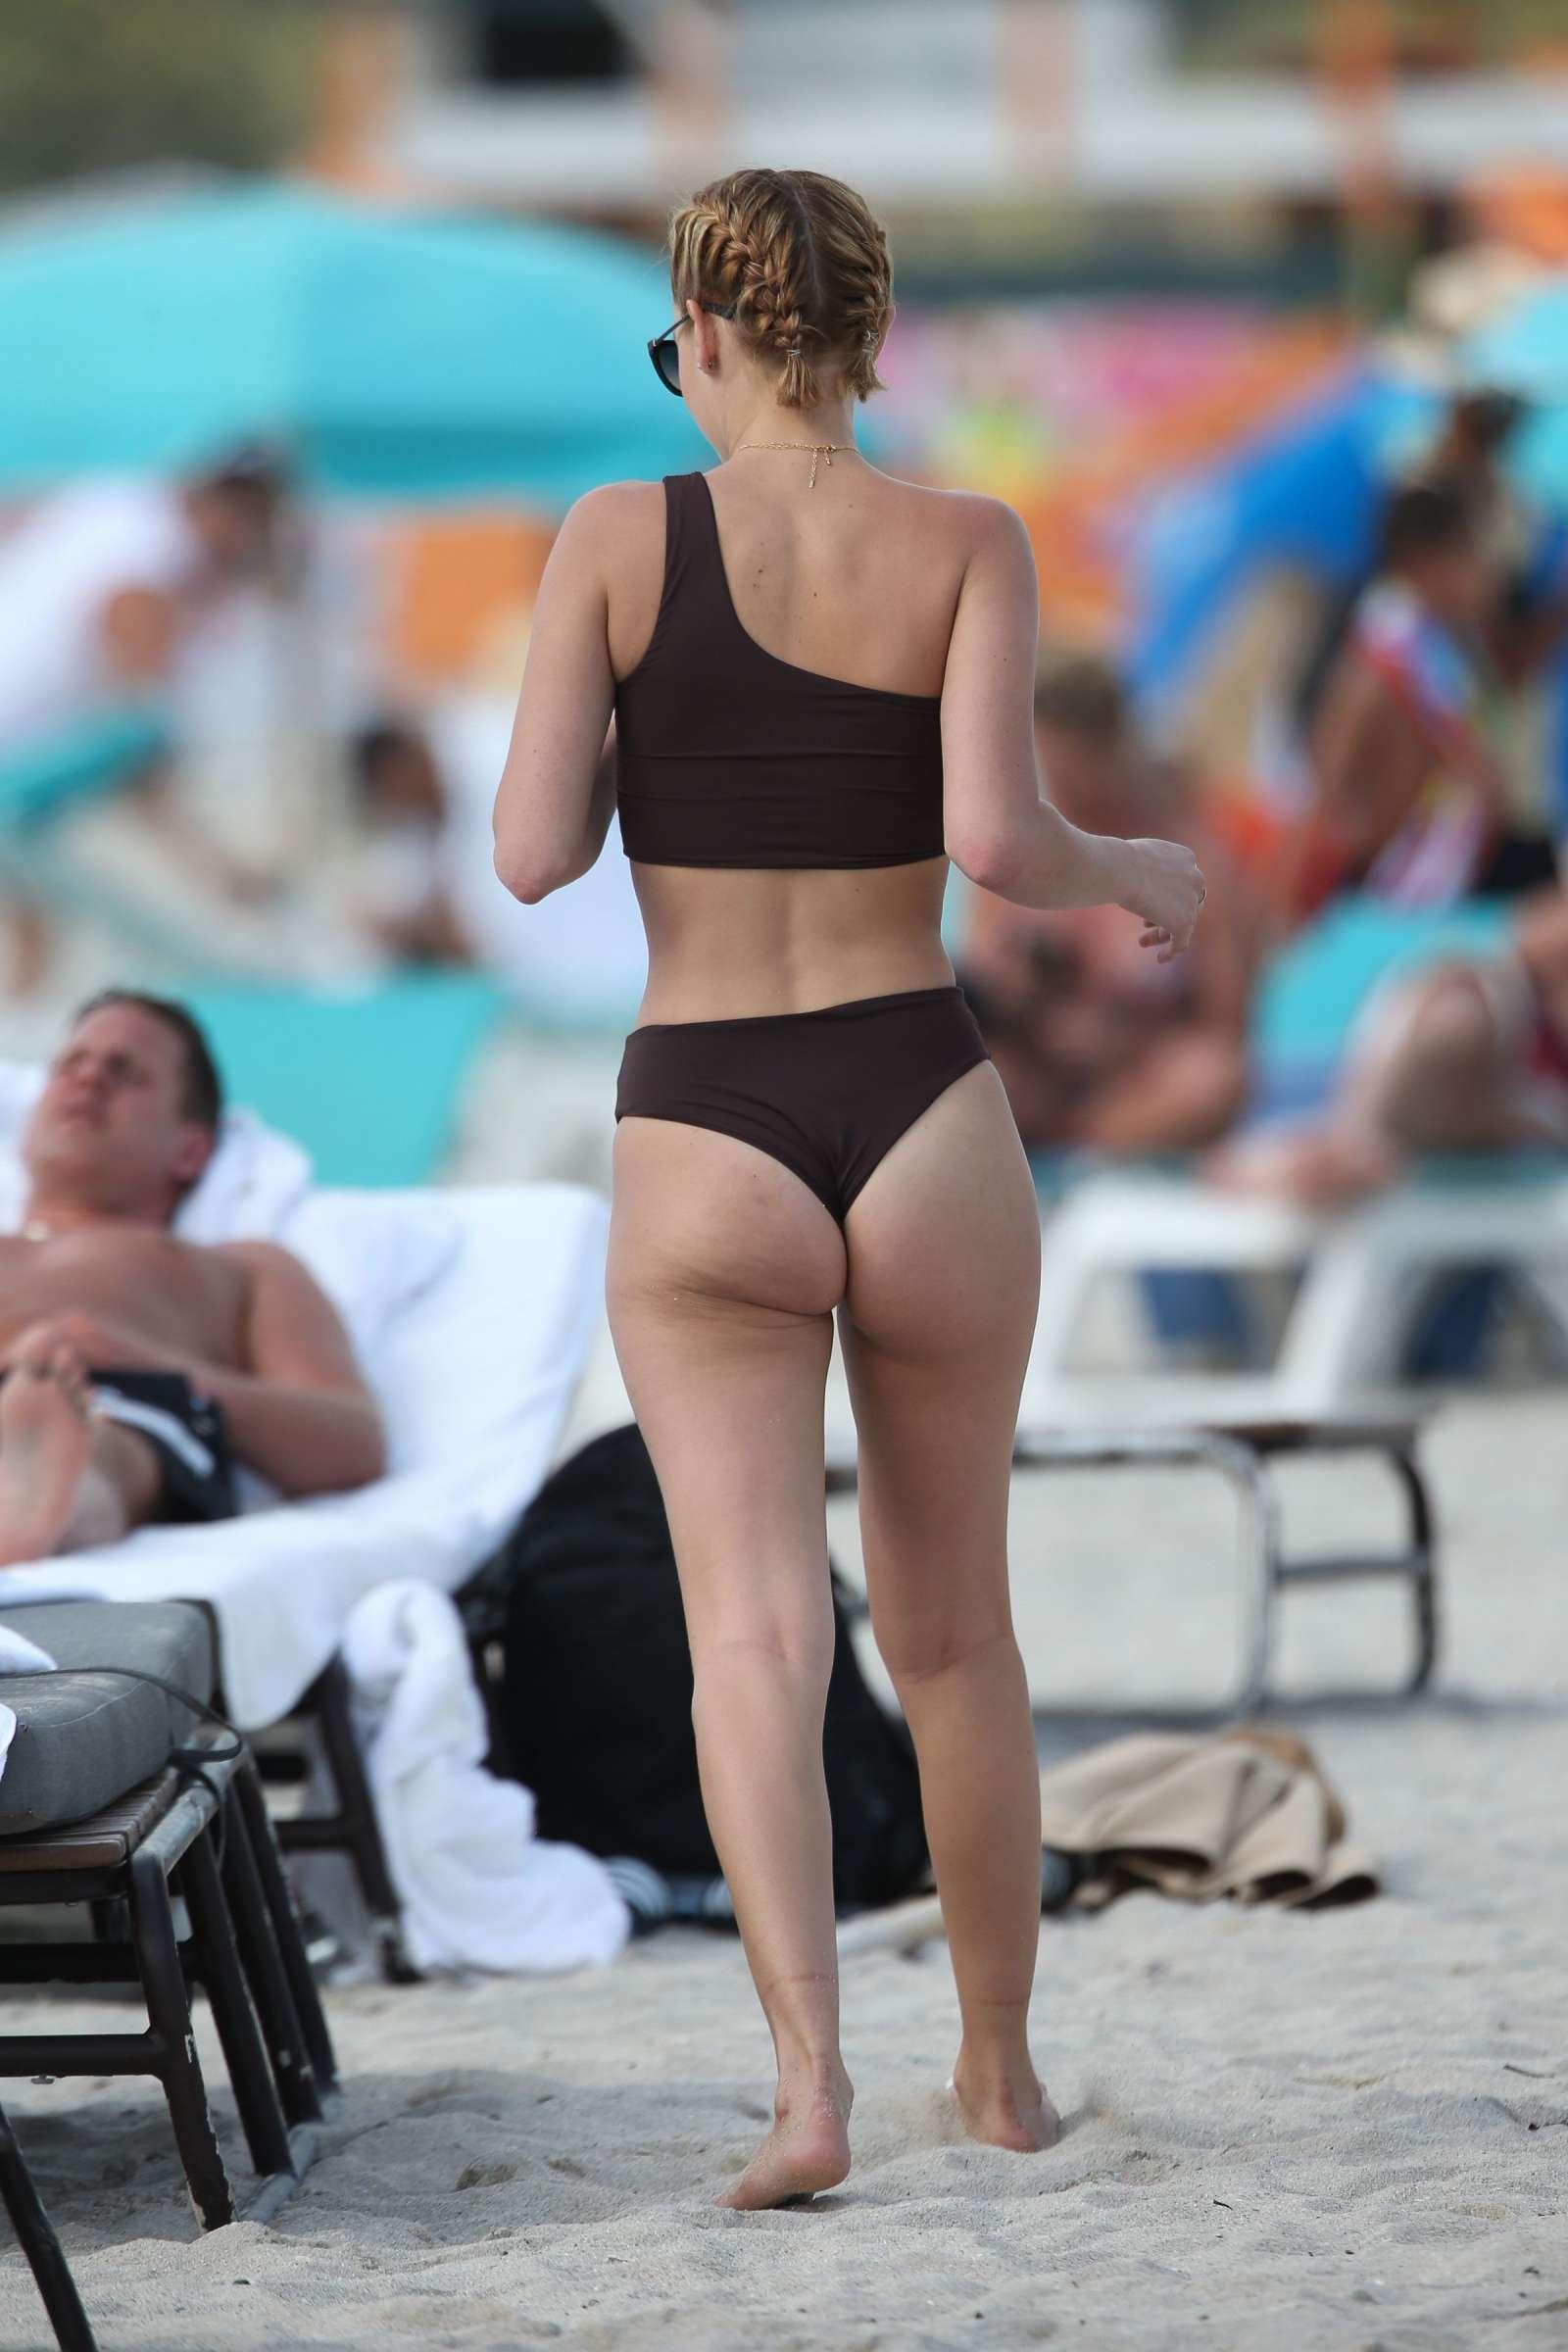 Bikini Sarah Snyder nudes (68 foto and video), Tits, Bikini, Feet, legs 2006